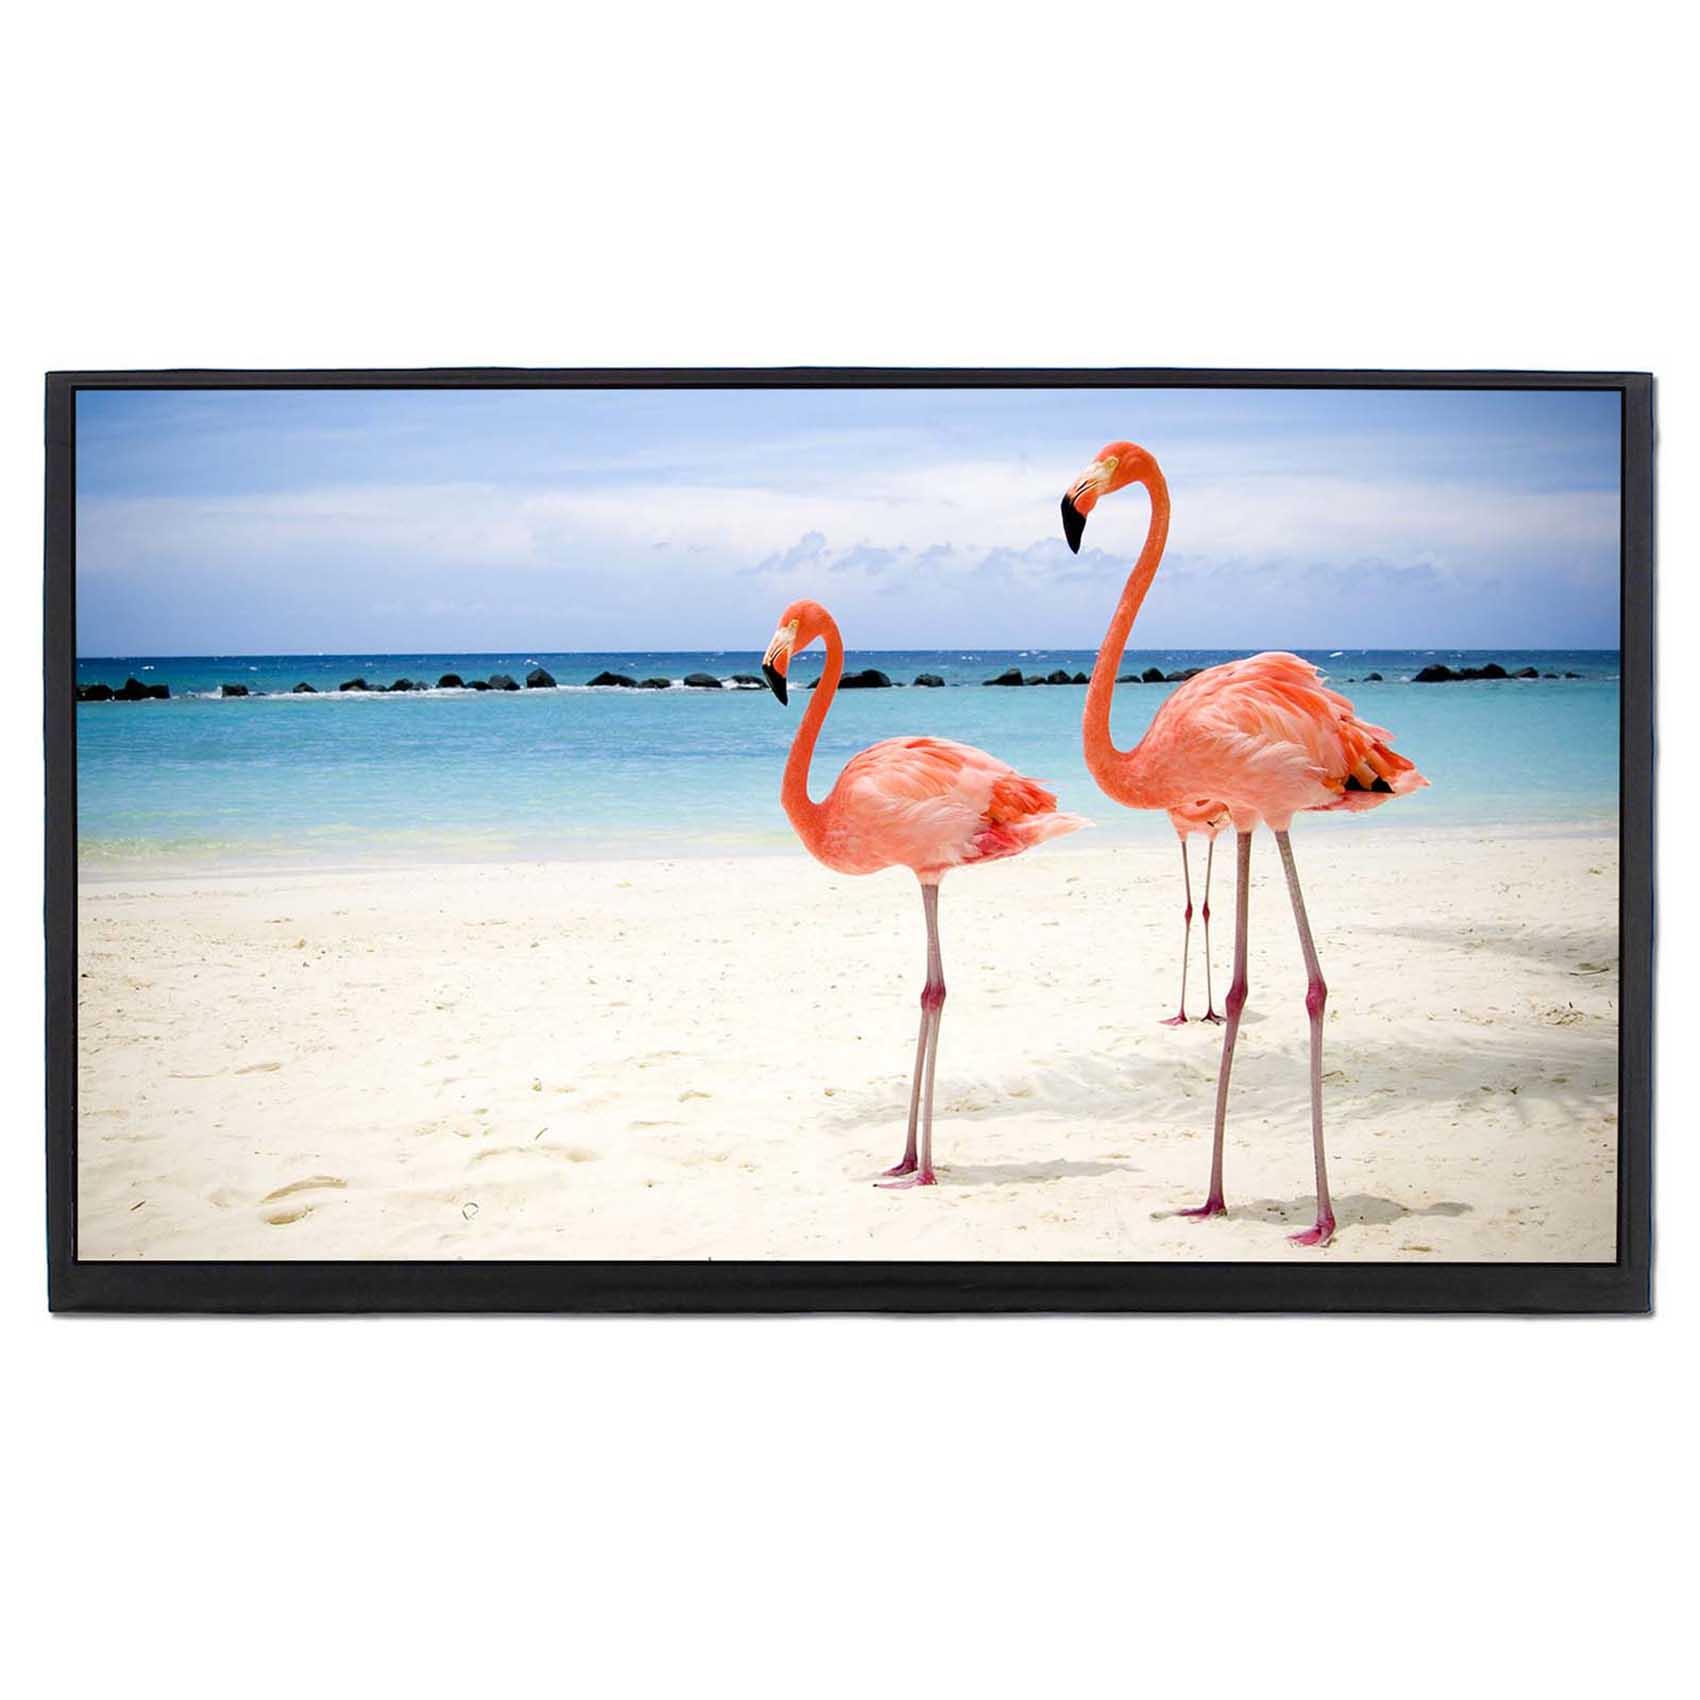 11.6inch LCD Screen M116X40 1920x1080 FHD Display 30Pin EDP LCD Panel n173hge e11 b173htn01 1 led lcd laptop screen 1920x1080 fhd panel display edp 30pin 17 3